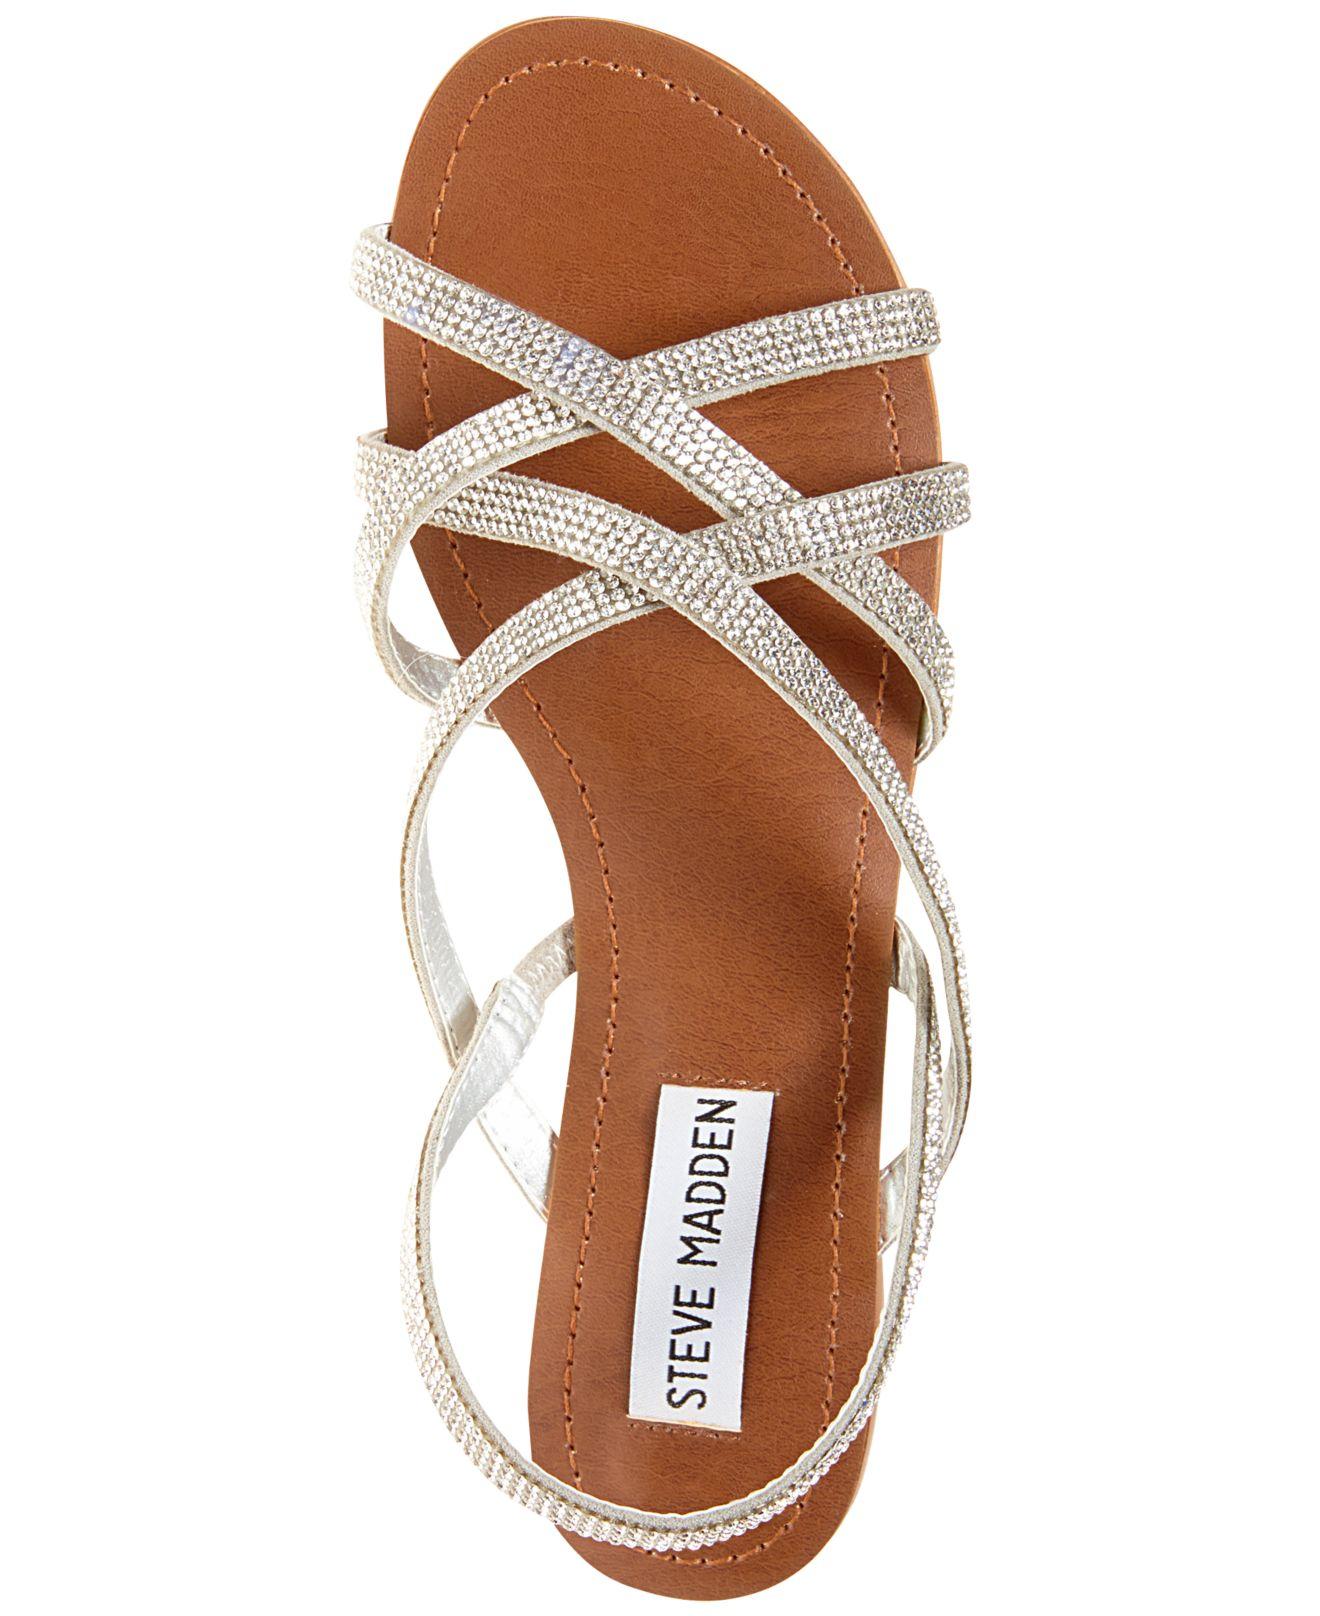 Steve Madden Women S Zippie Flat Sandals In White Lyst